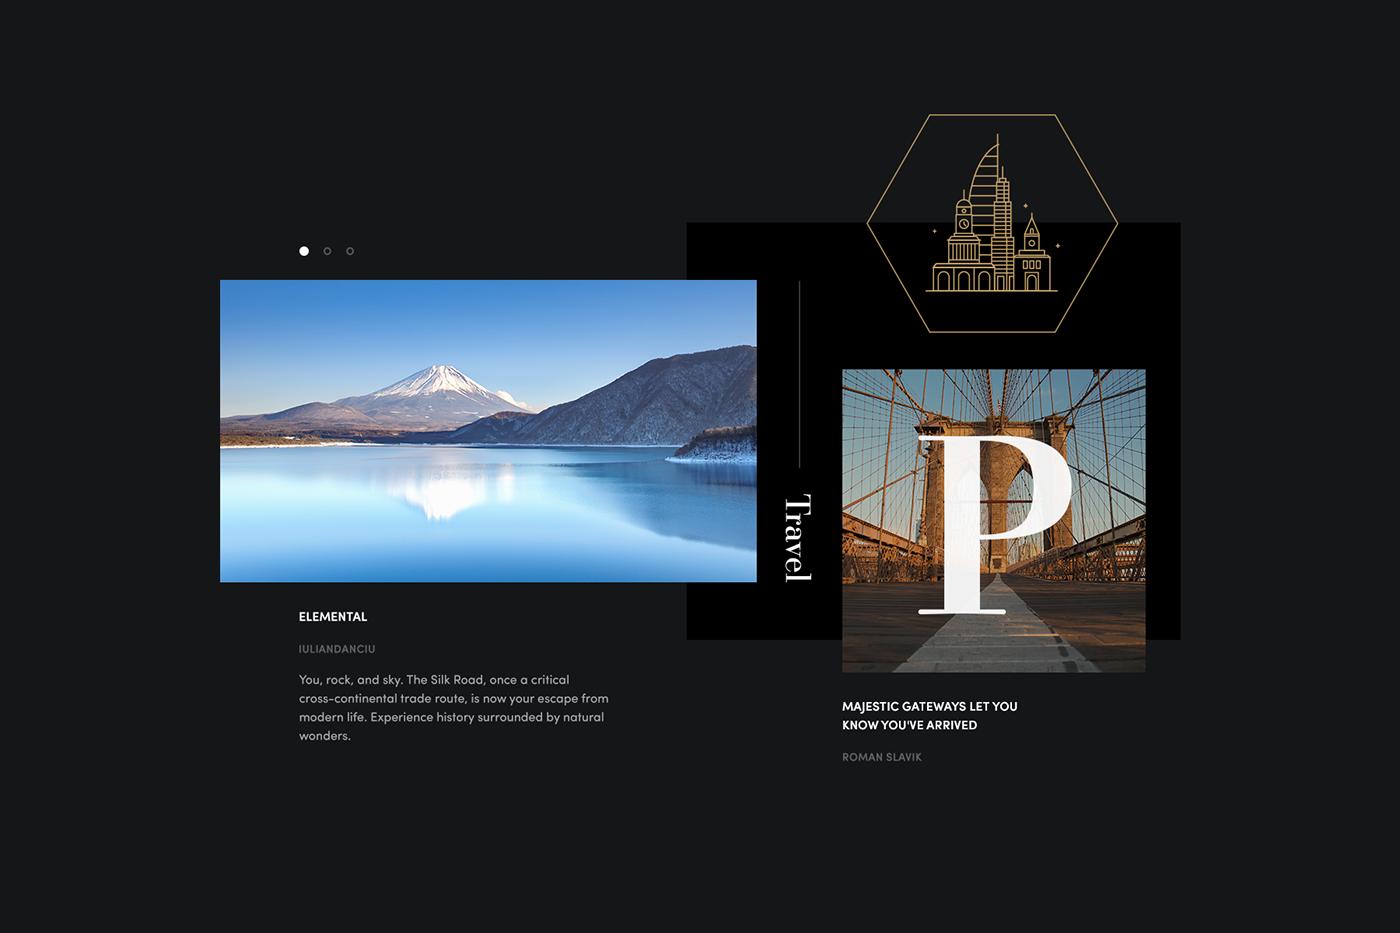 prism dreamweaver adobe Website sophisticated sleek dark gold chic luxury Responsive